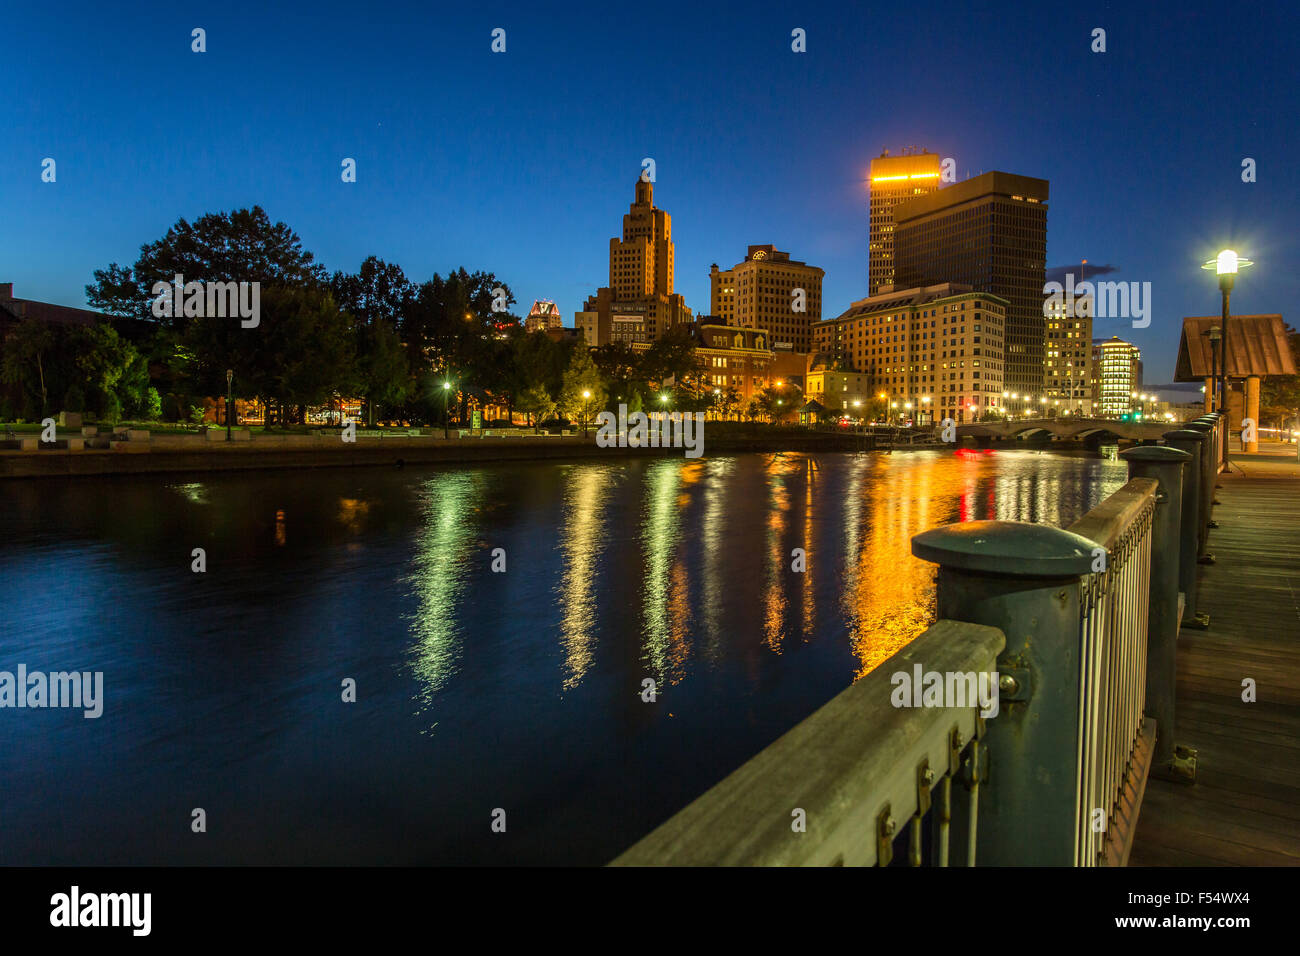 providence city night scape - Stock Image